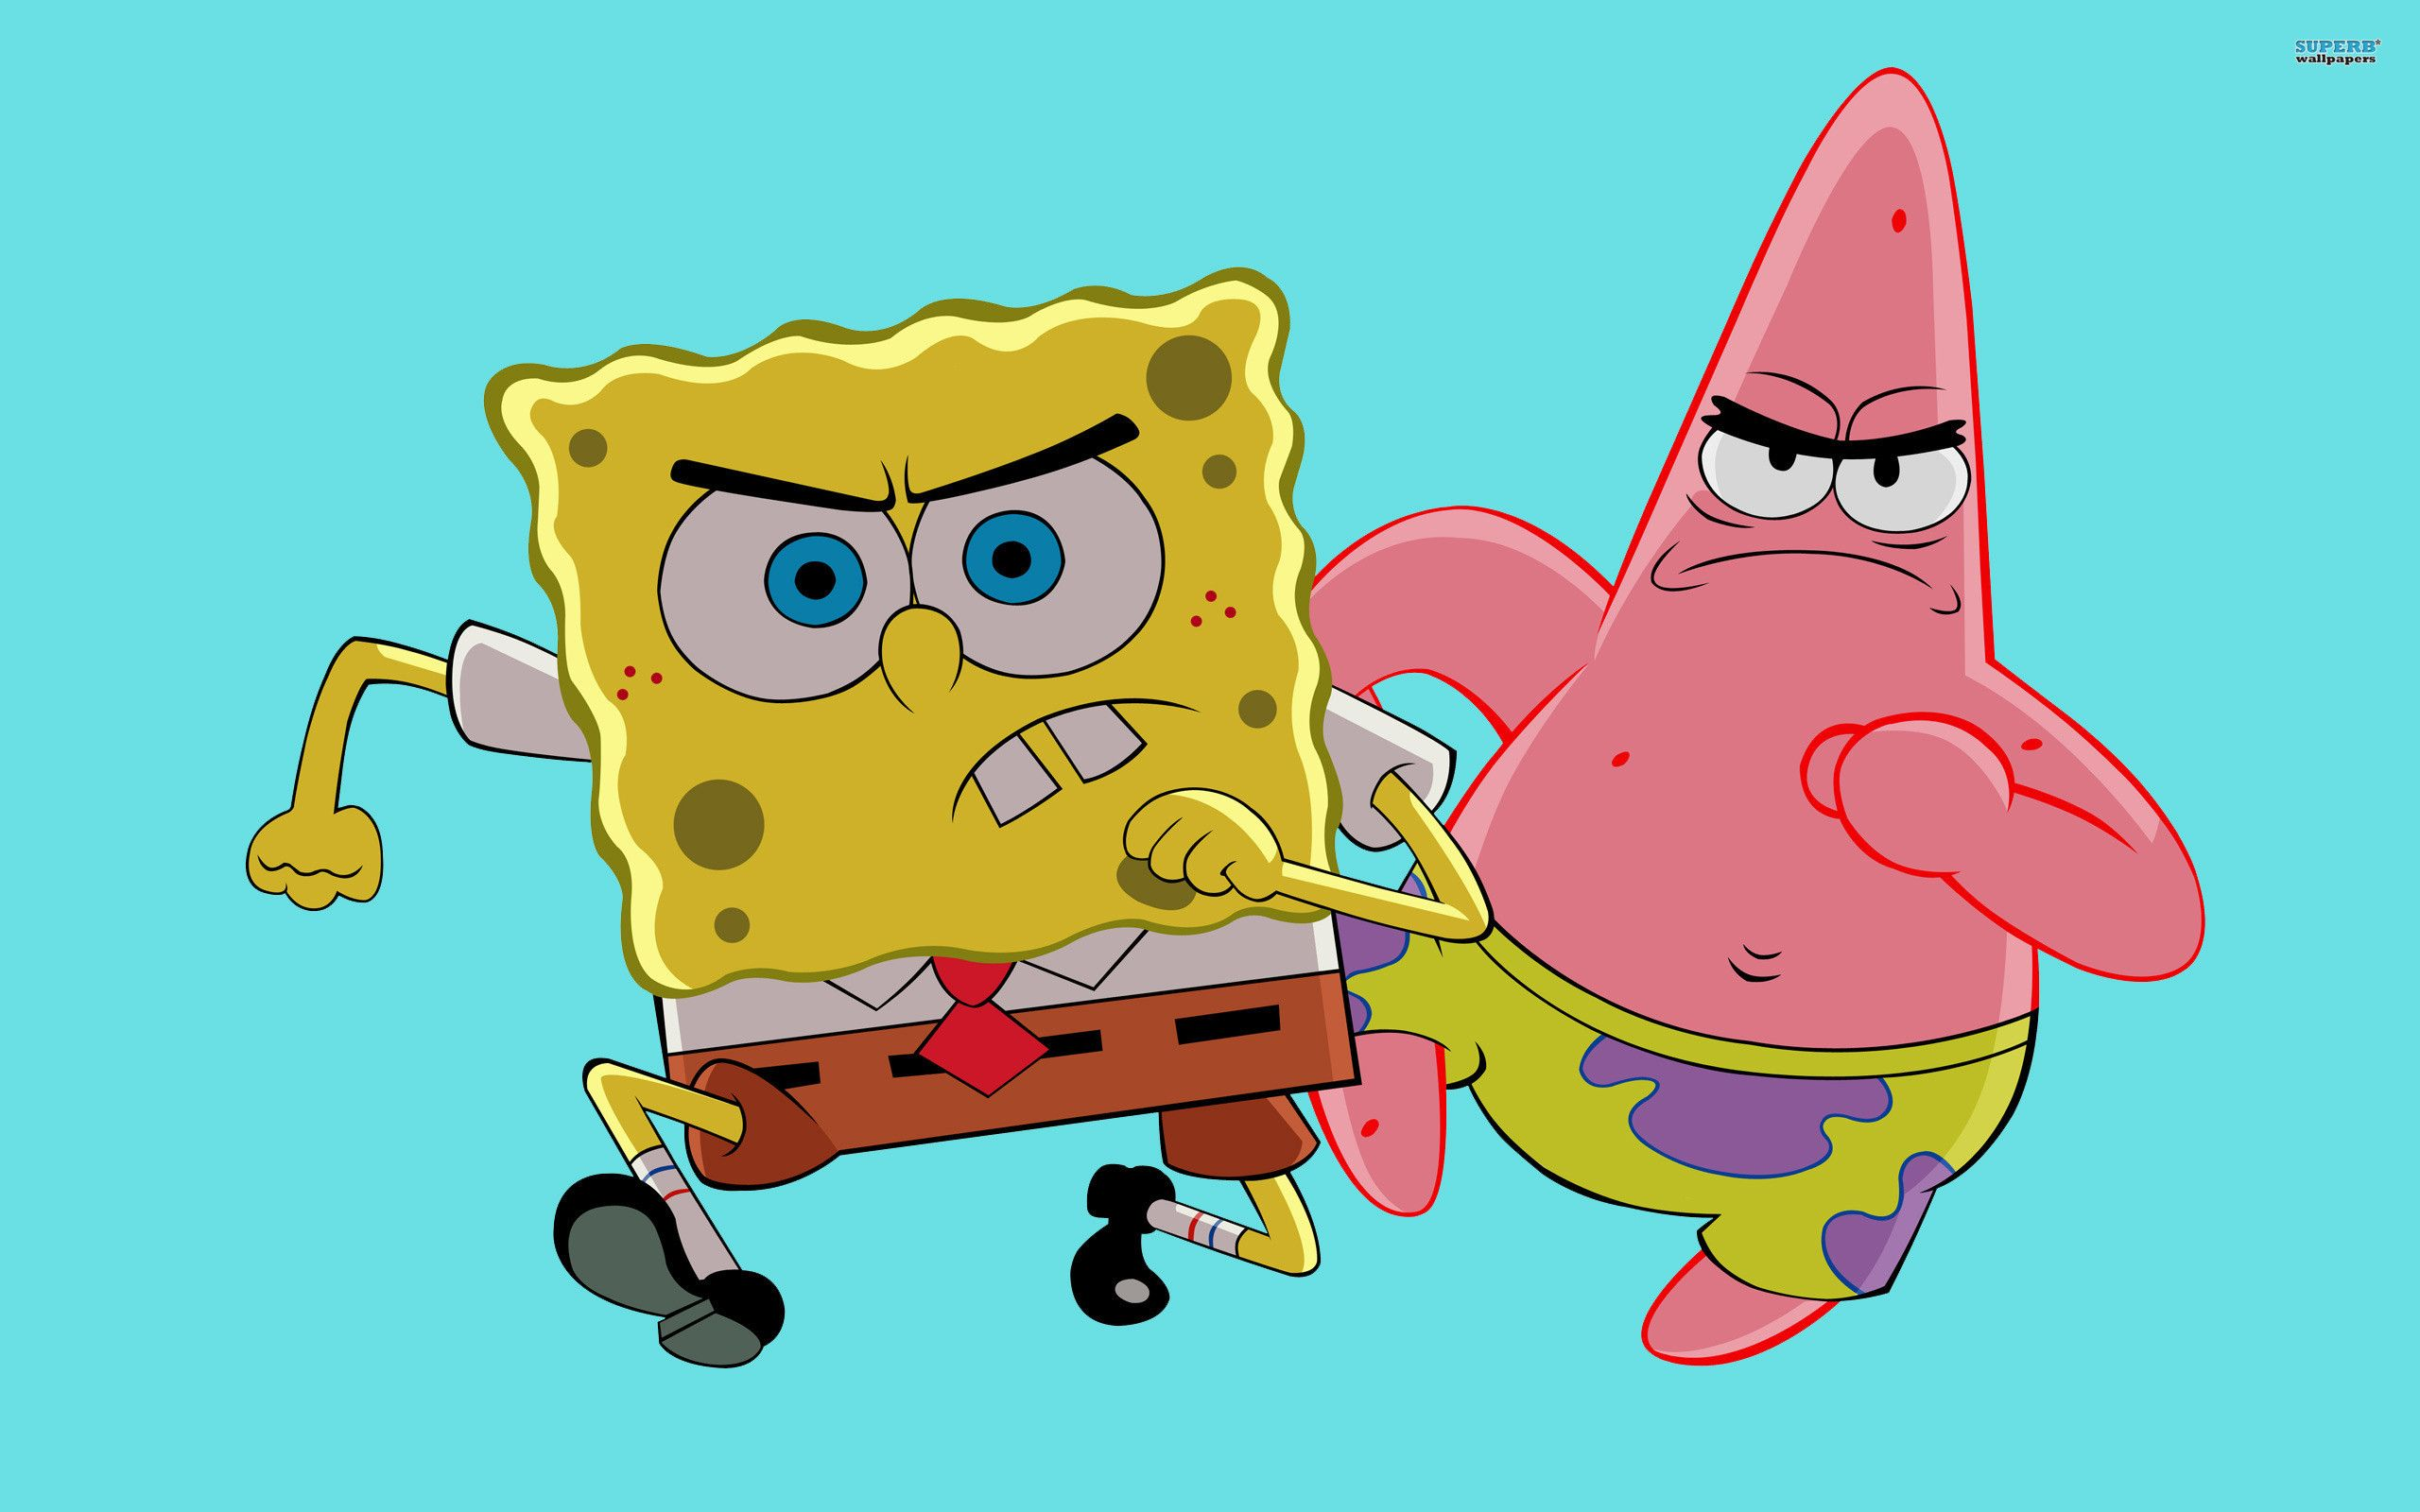 Greatestanime Com Spongebob Drawings Cute Cartoon Wallpapers Spongebob